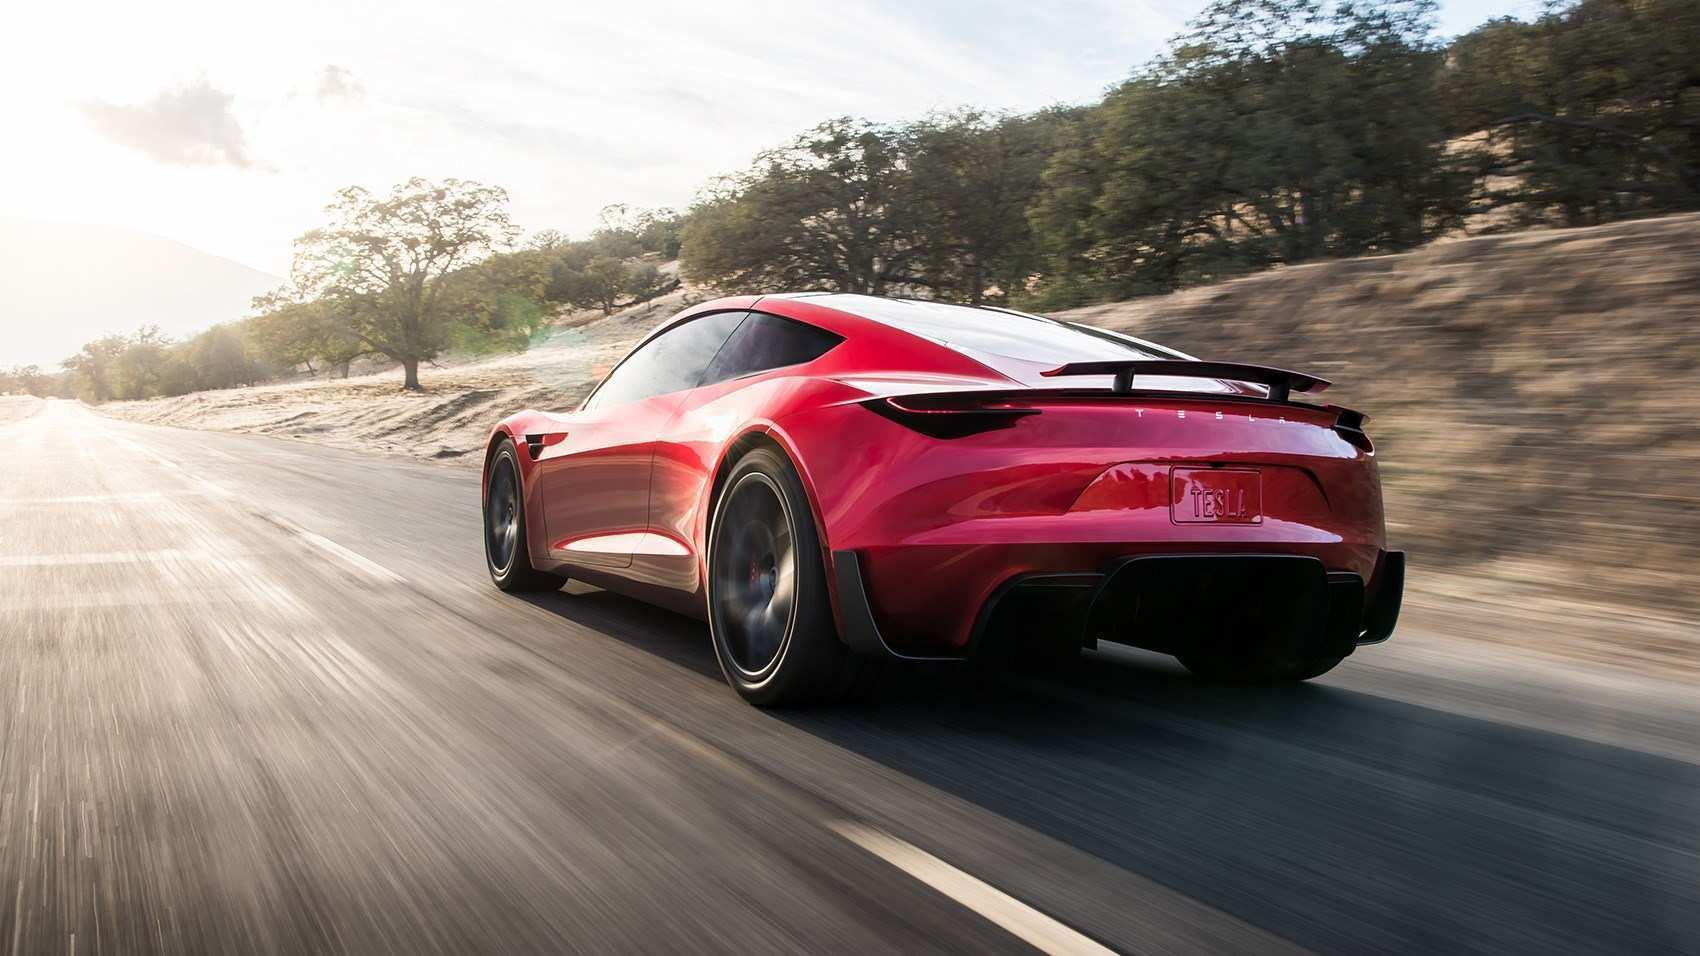 49 Gallery of Tesla 2020 Roadster Pre Order Overview for Tesla 2020 Roadster Pre Order